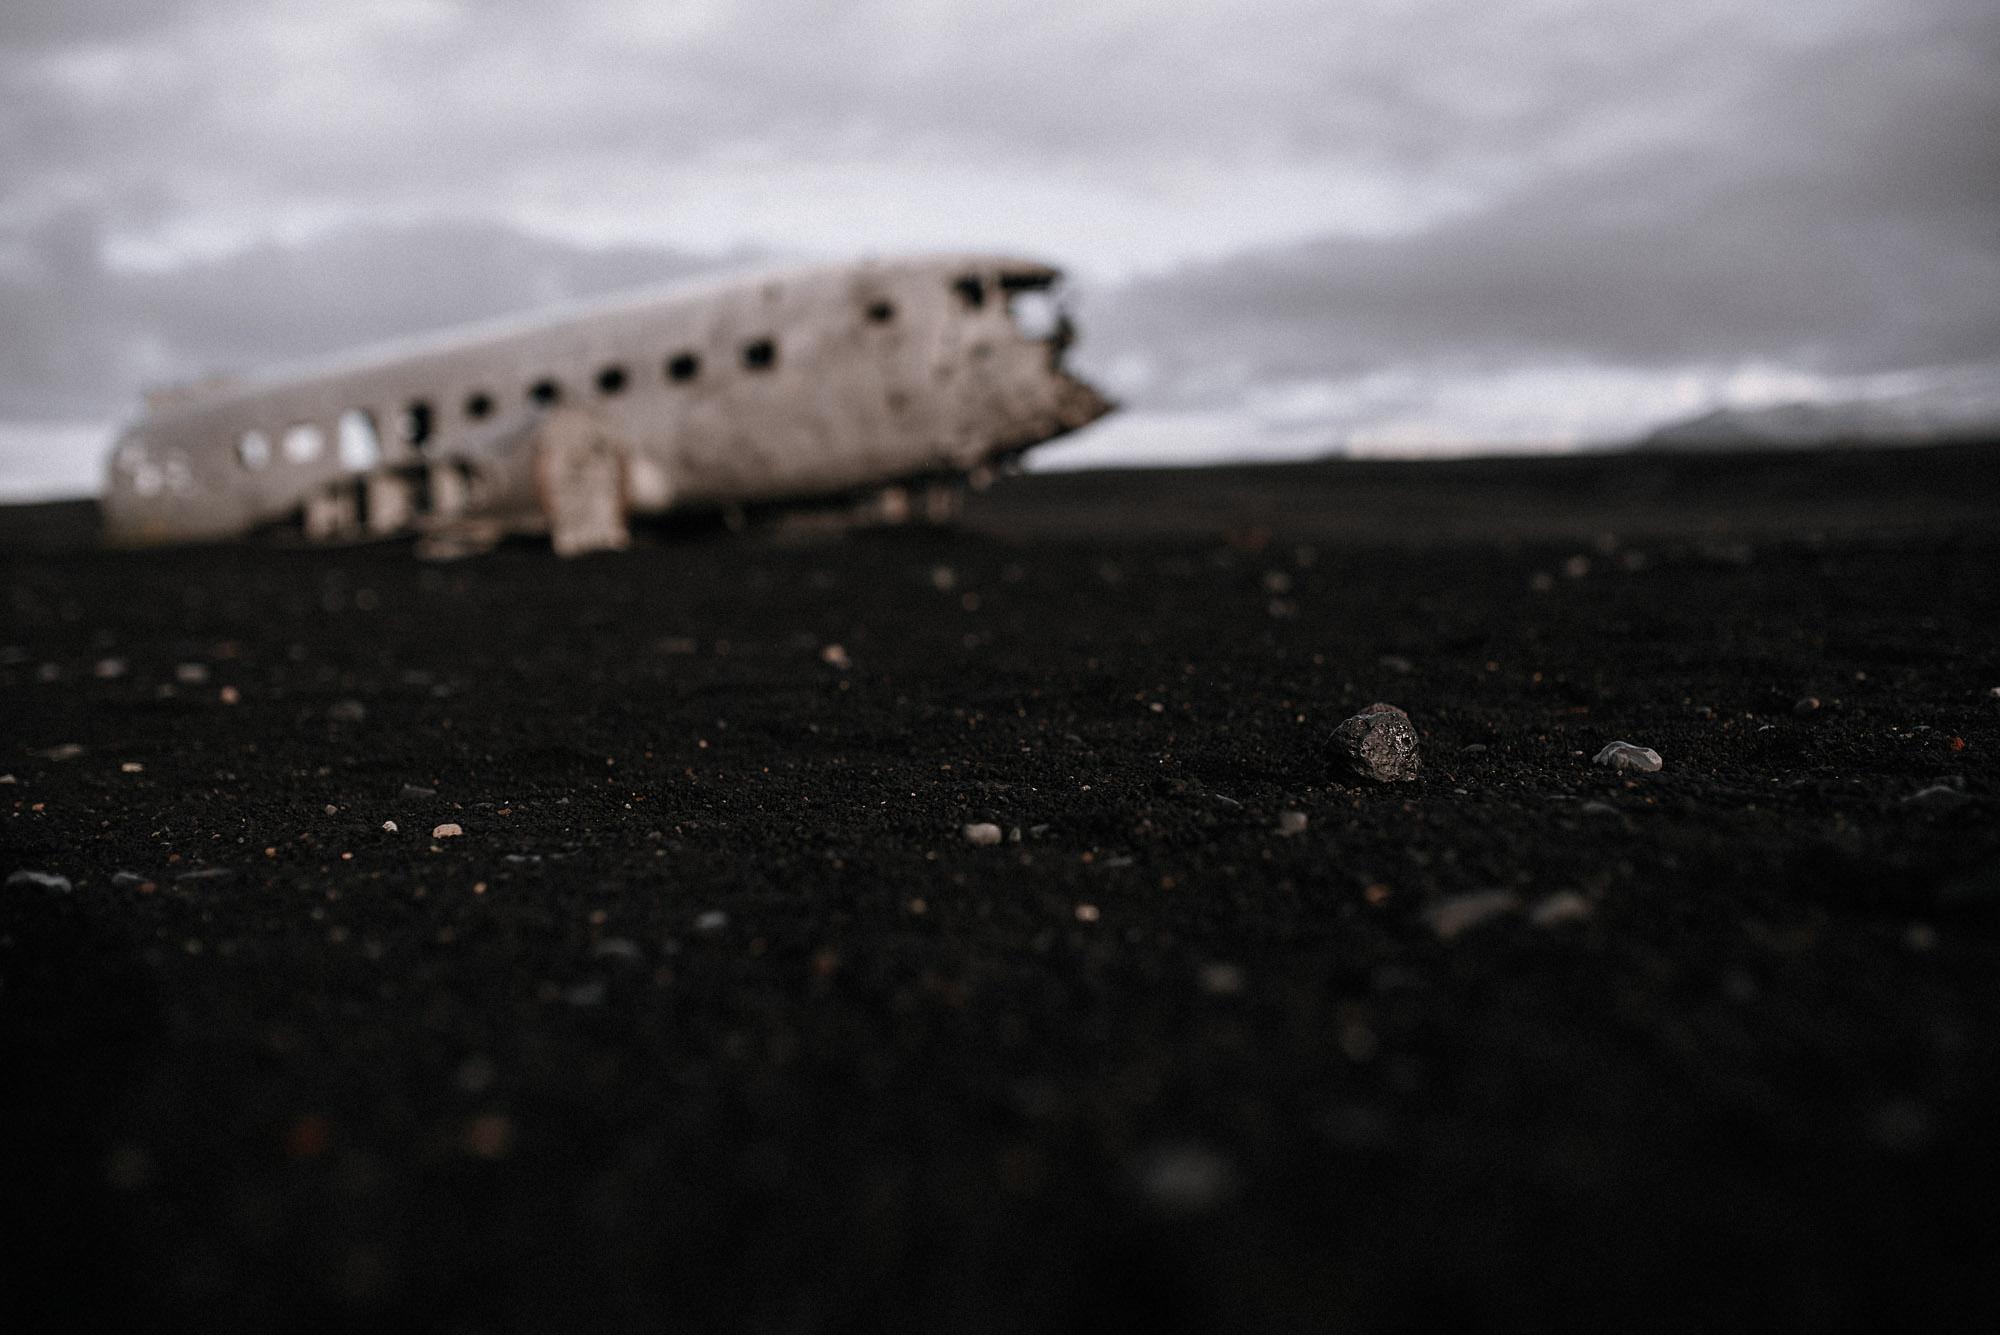 iceland-photographer-reykjavik-jere-satamo-5-web.jpg